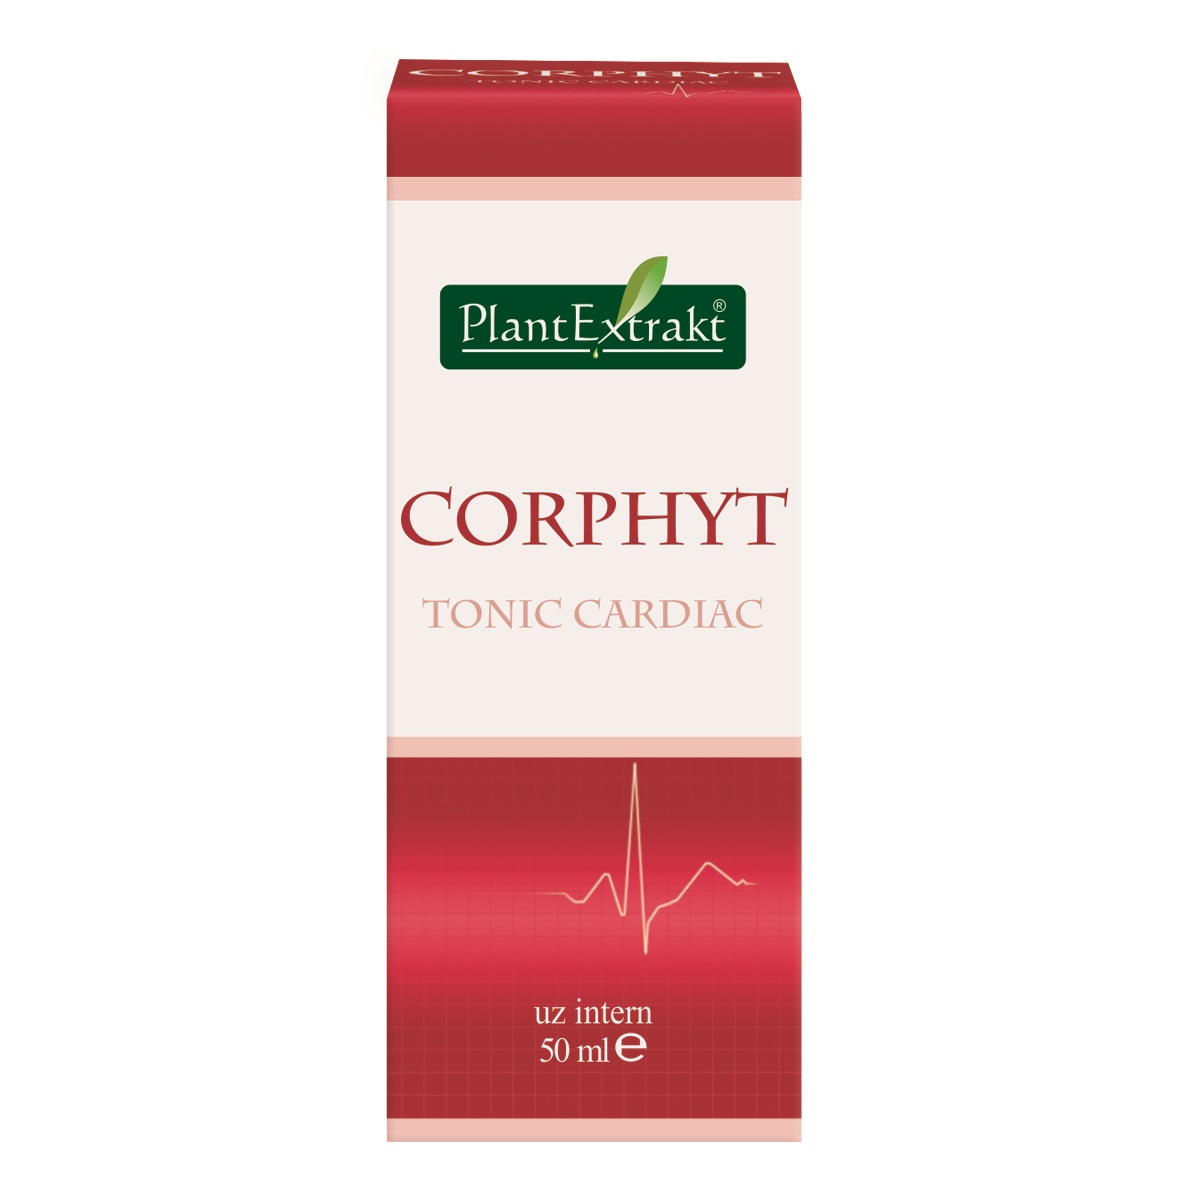 Corphyt, 50ml, Plantextrakt imagine produs 2021